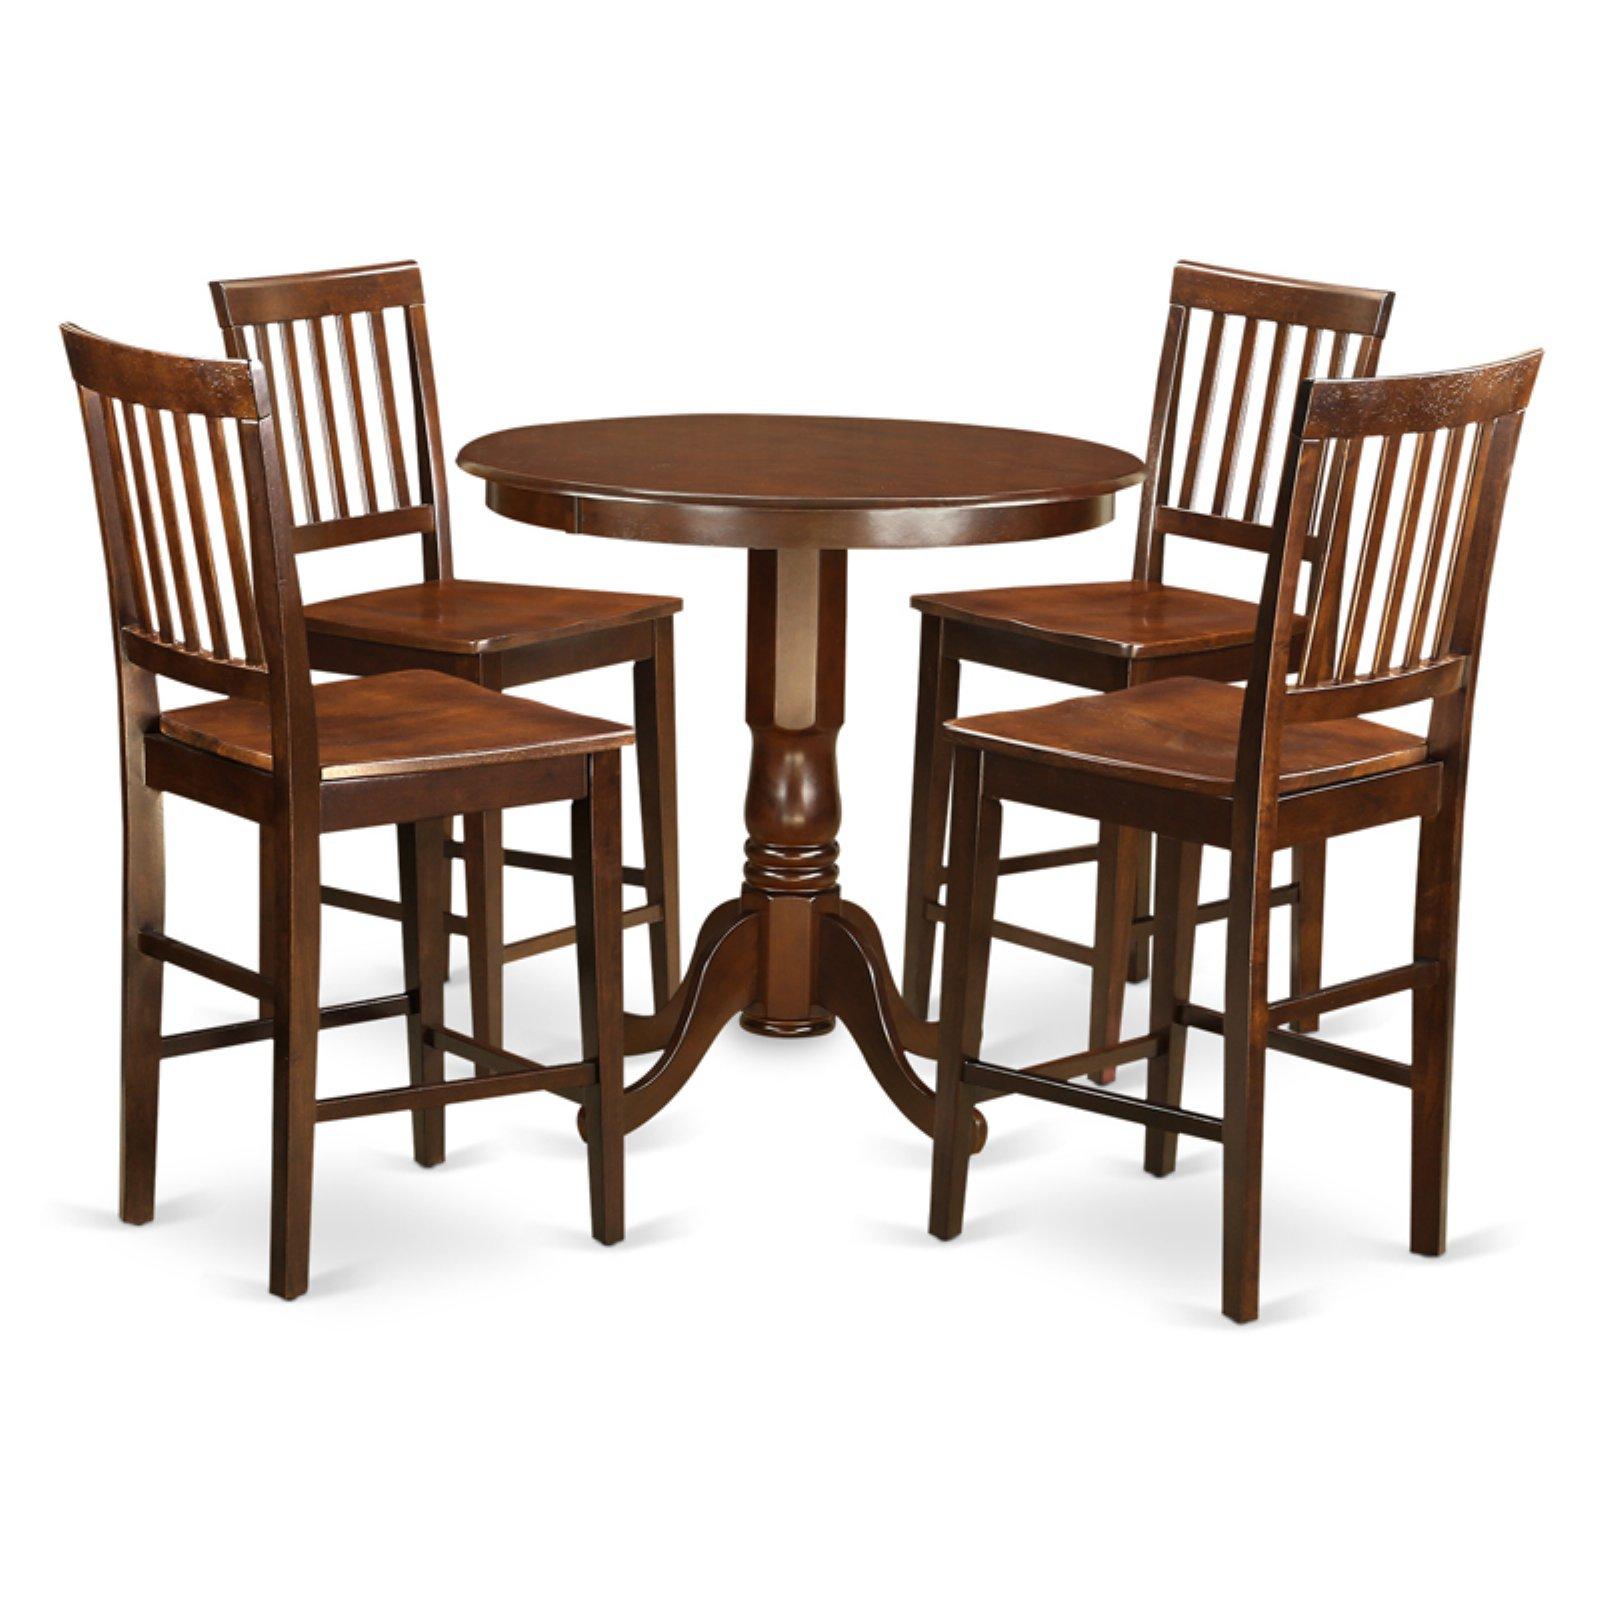 East West Furniture Jackson 5 Piece Slat Back Dining Table Set